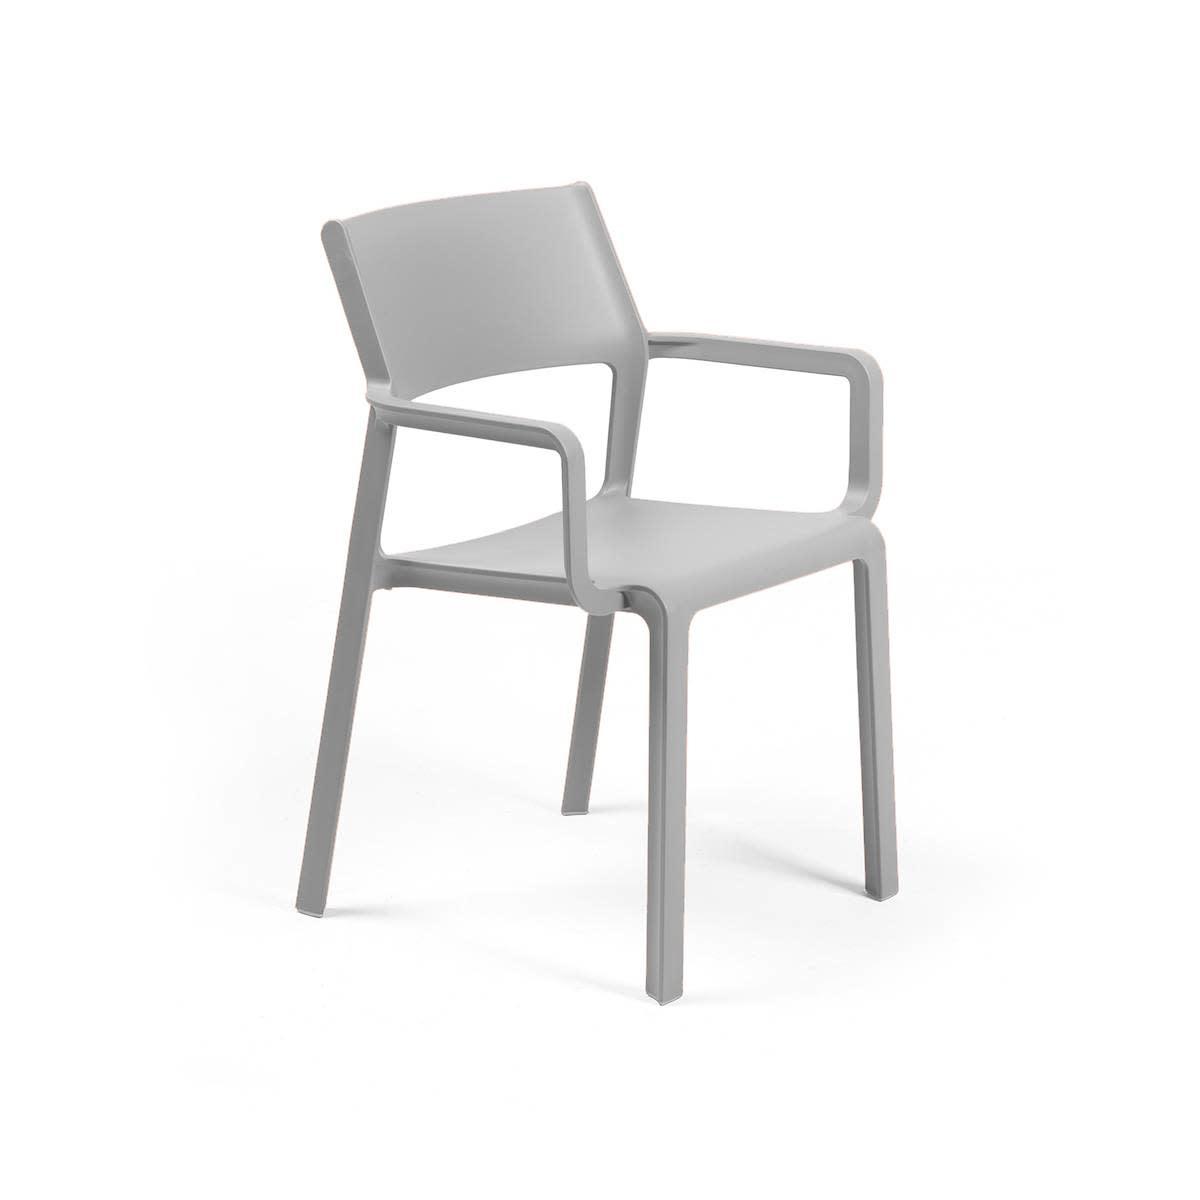 Trill Armchair - Grigio